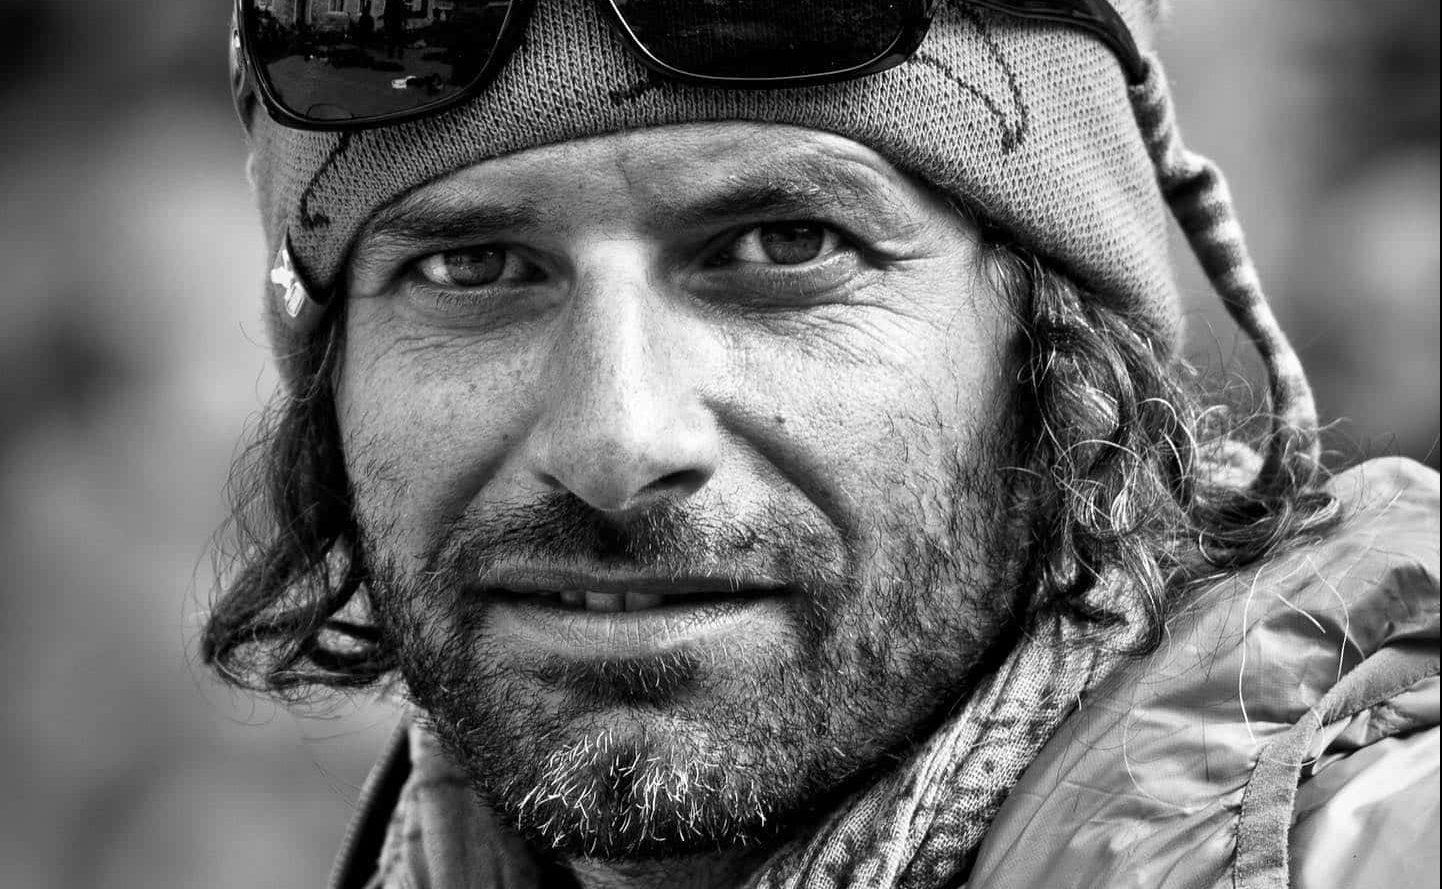 avalanche, killed, Luca Pandolfi, jones snowboards